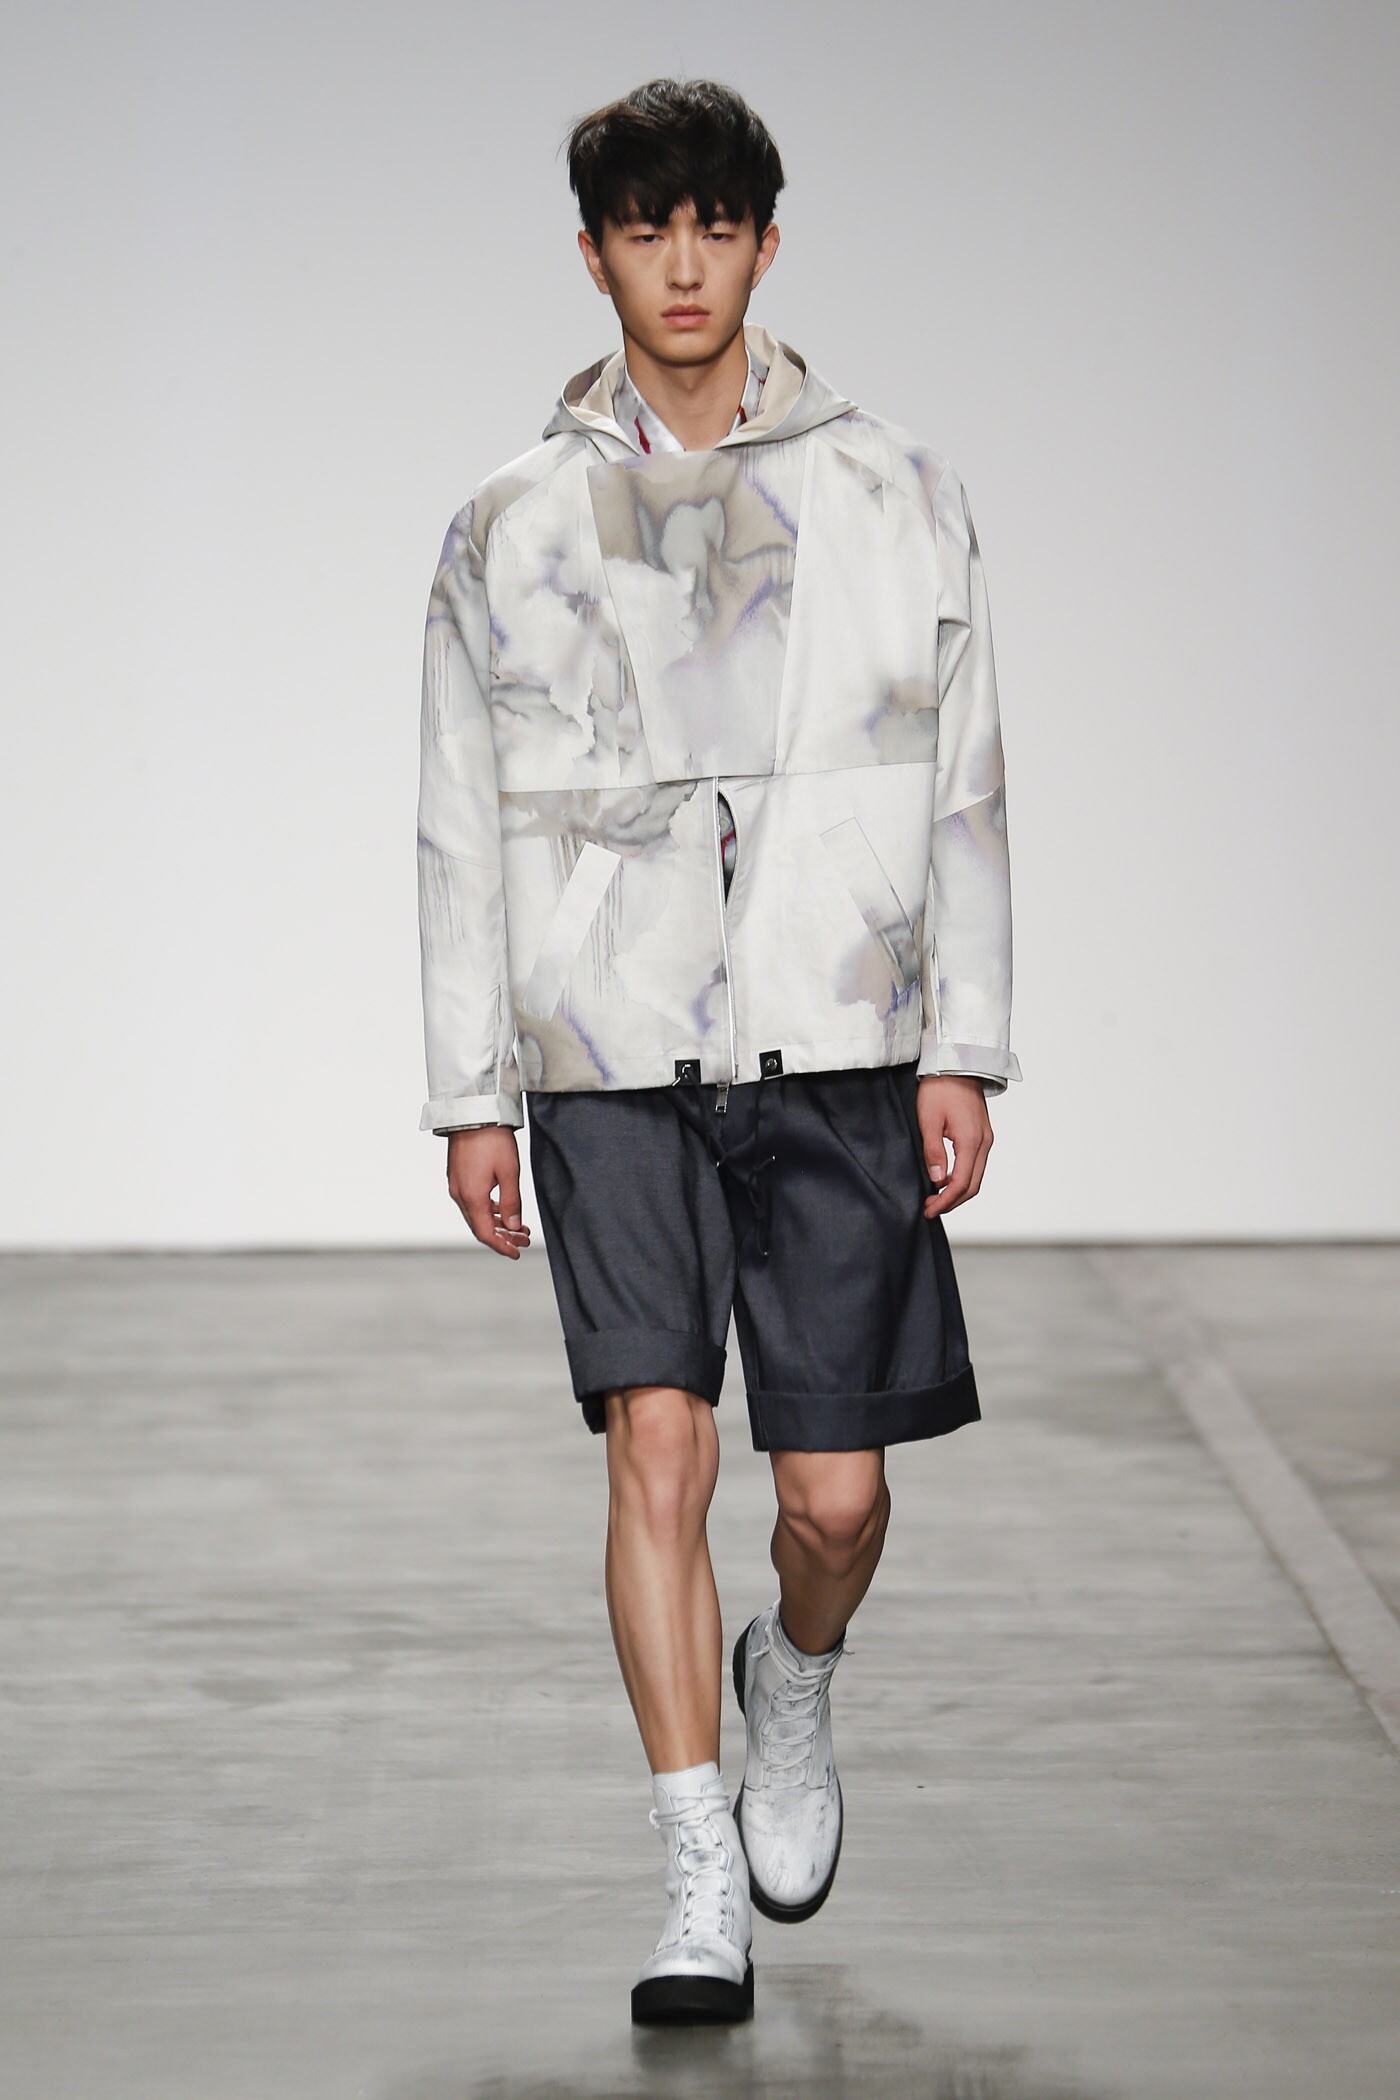 2015 Iceberg Spring Summer Menswear